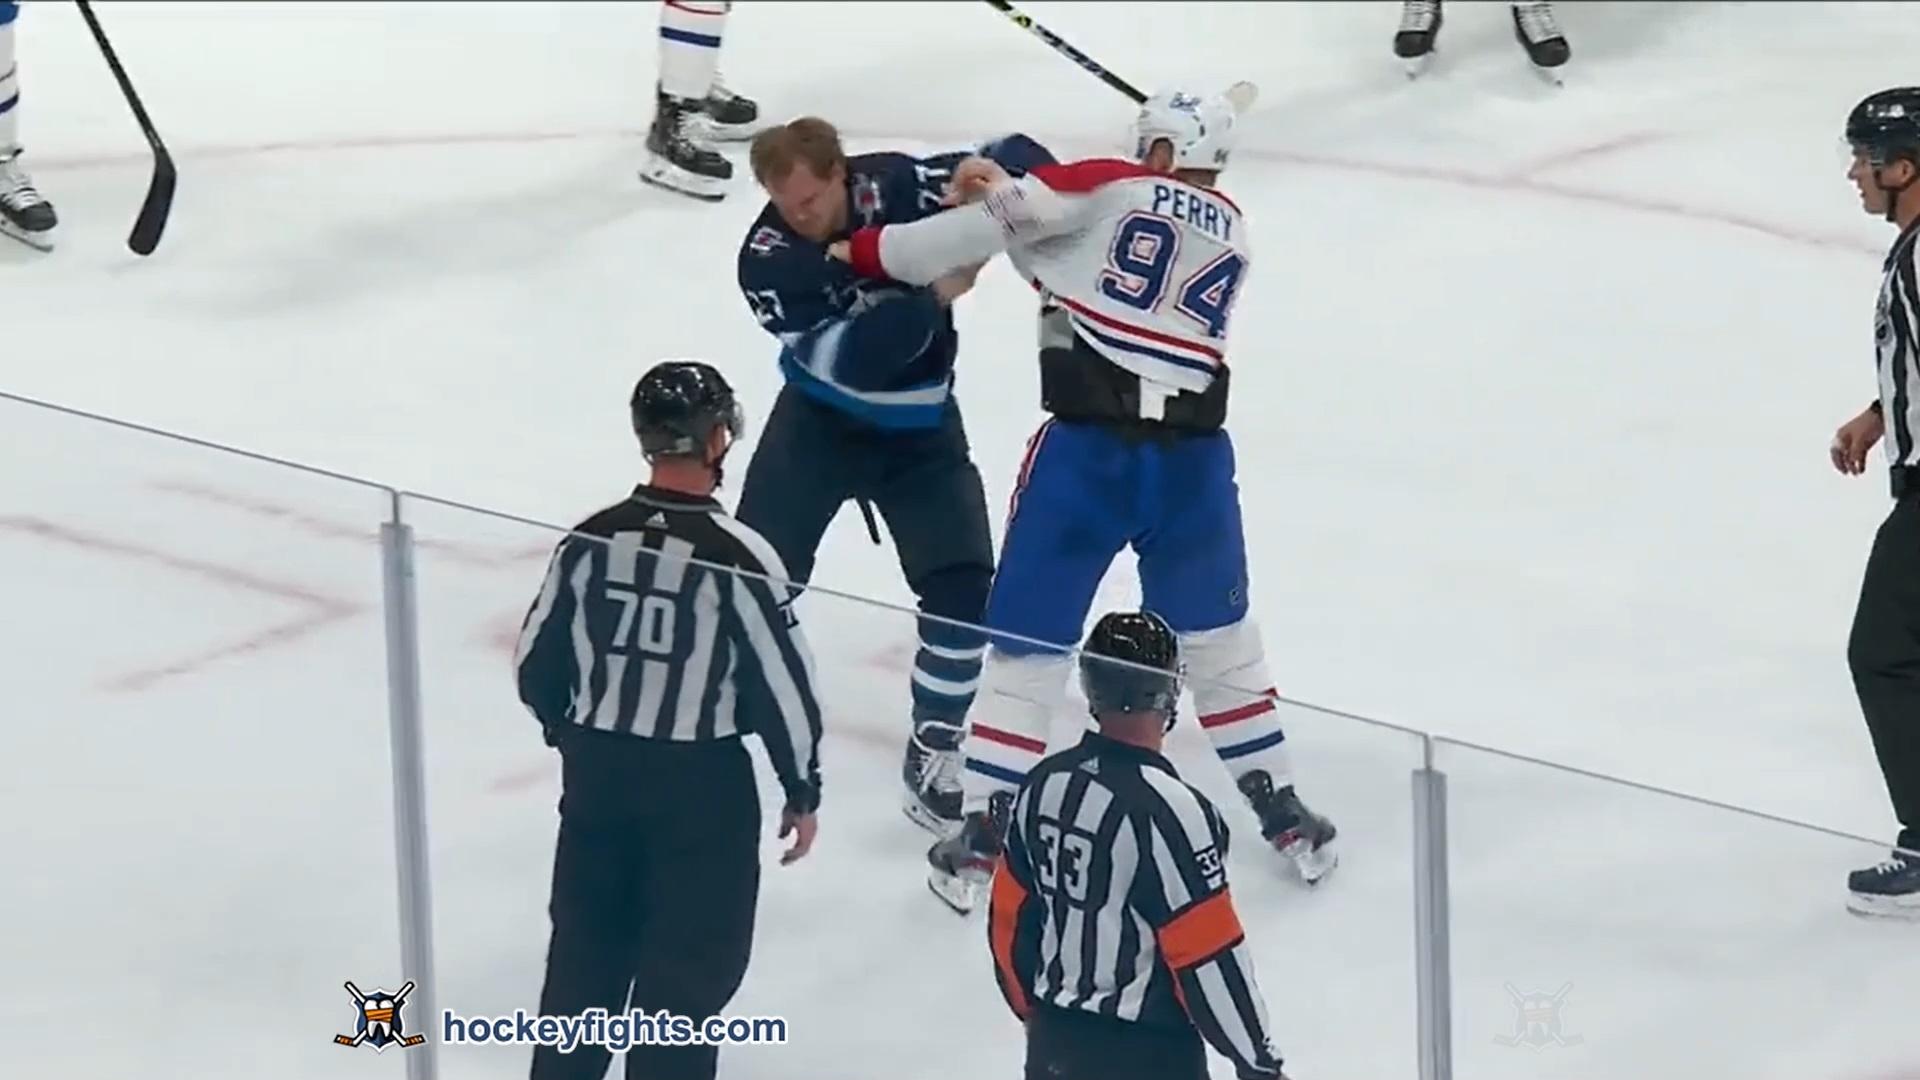 Nikolaj Ehlers vs. Corey Perry